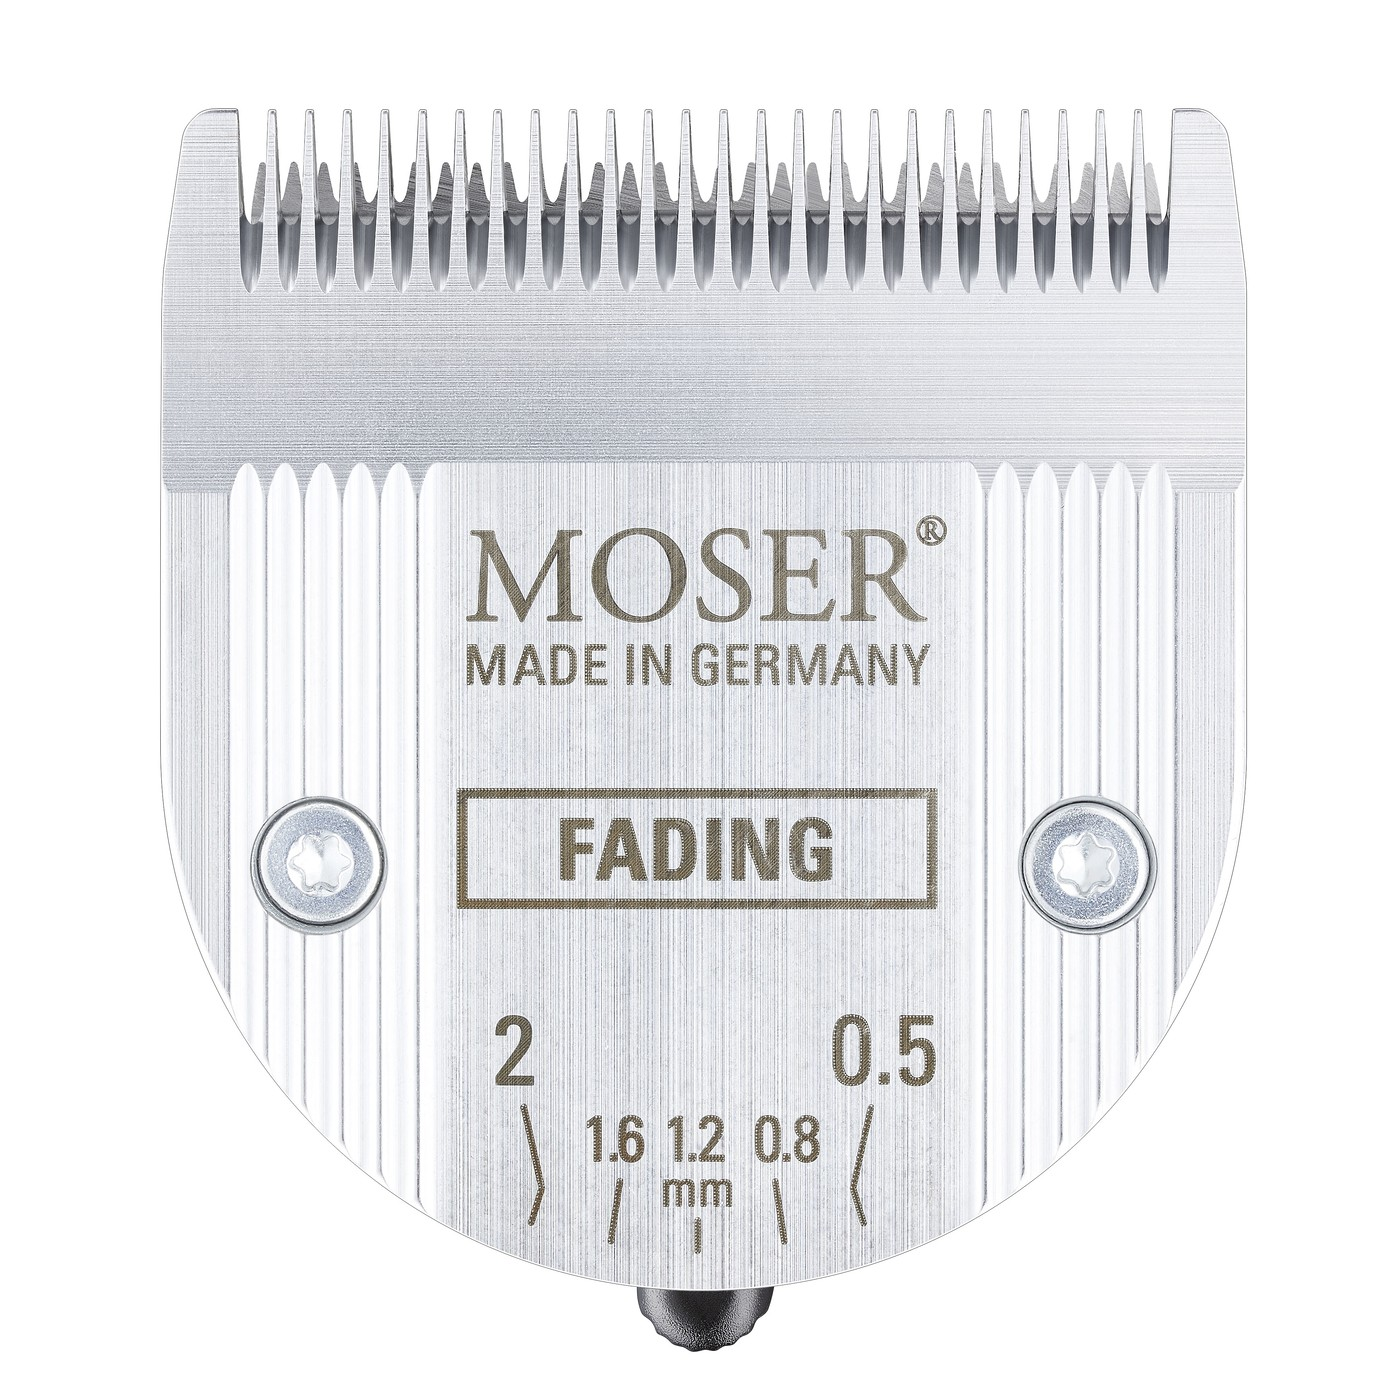 MOSER 1887-7020Fading Blade 1